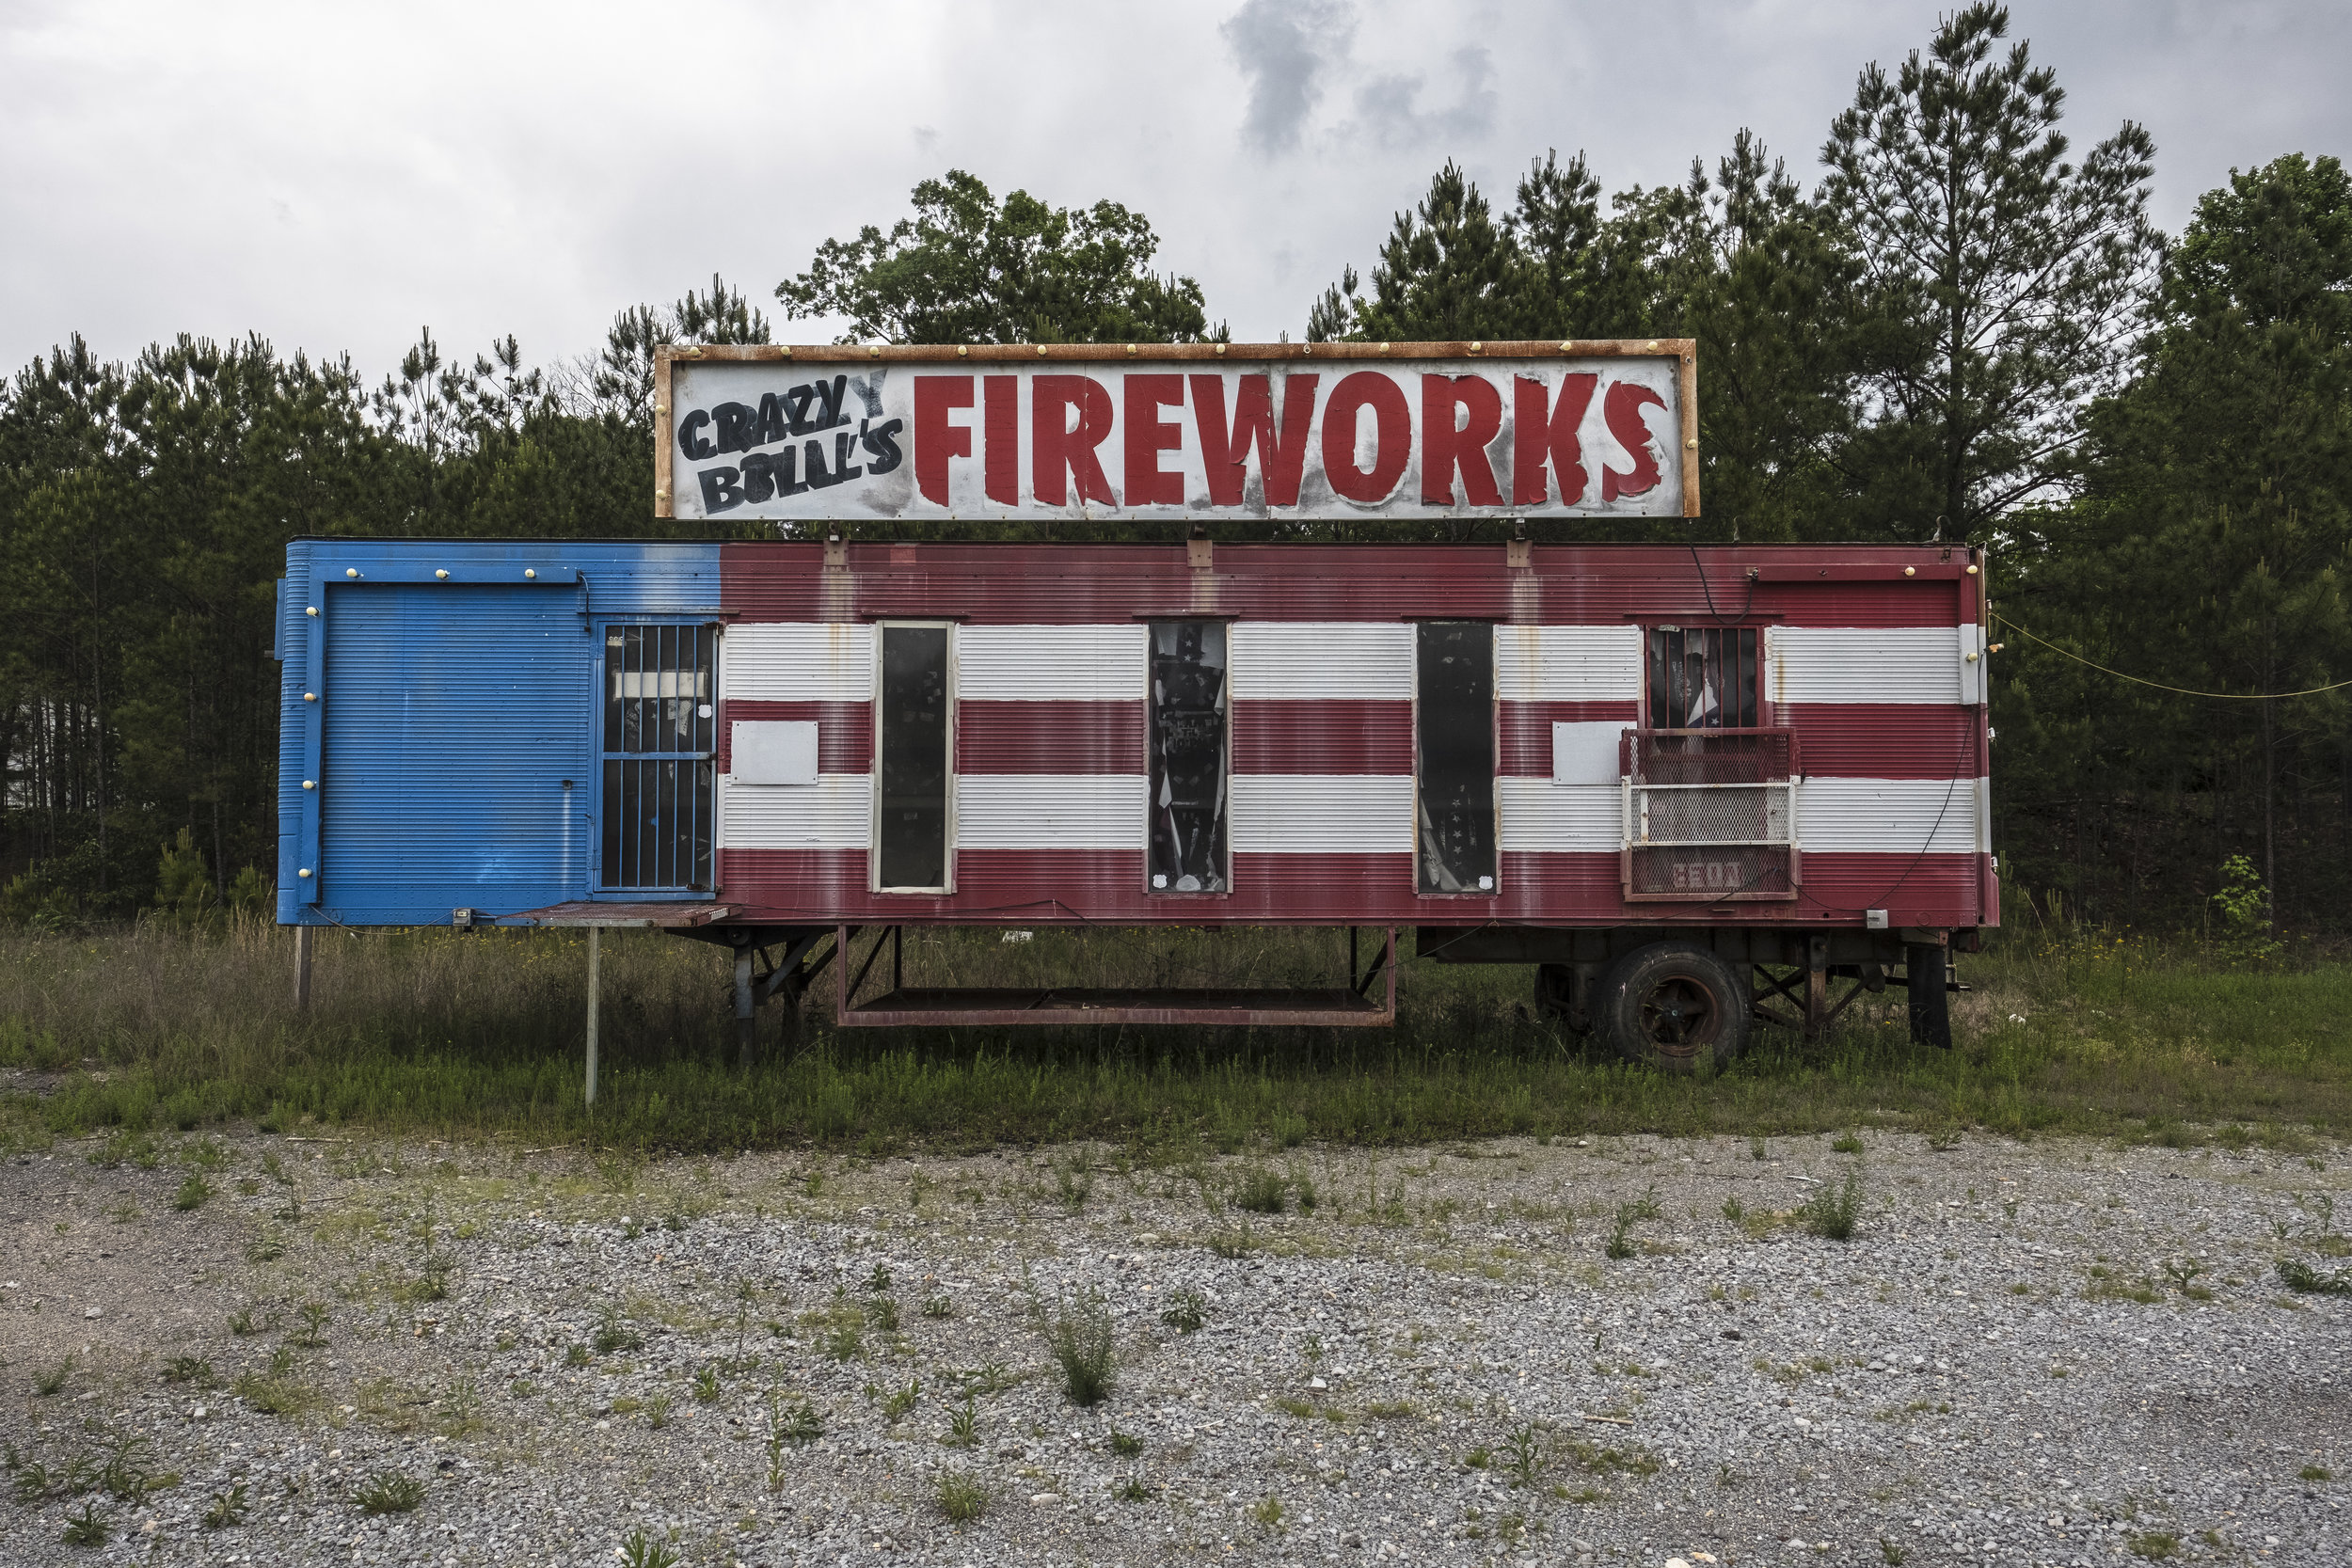 BBP-Fireworks-05052018-2.jpg